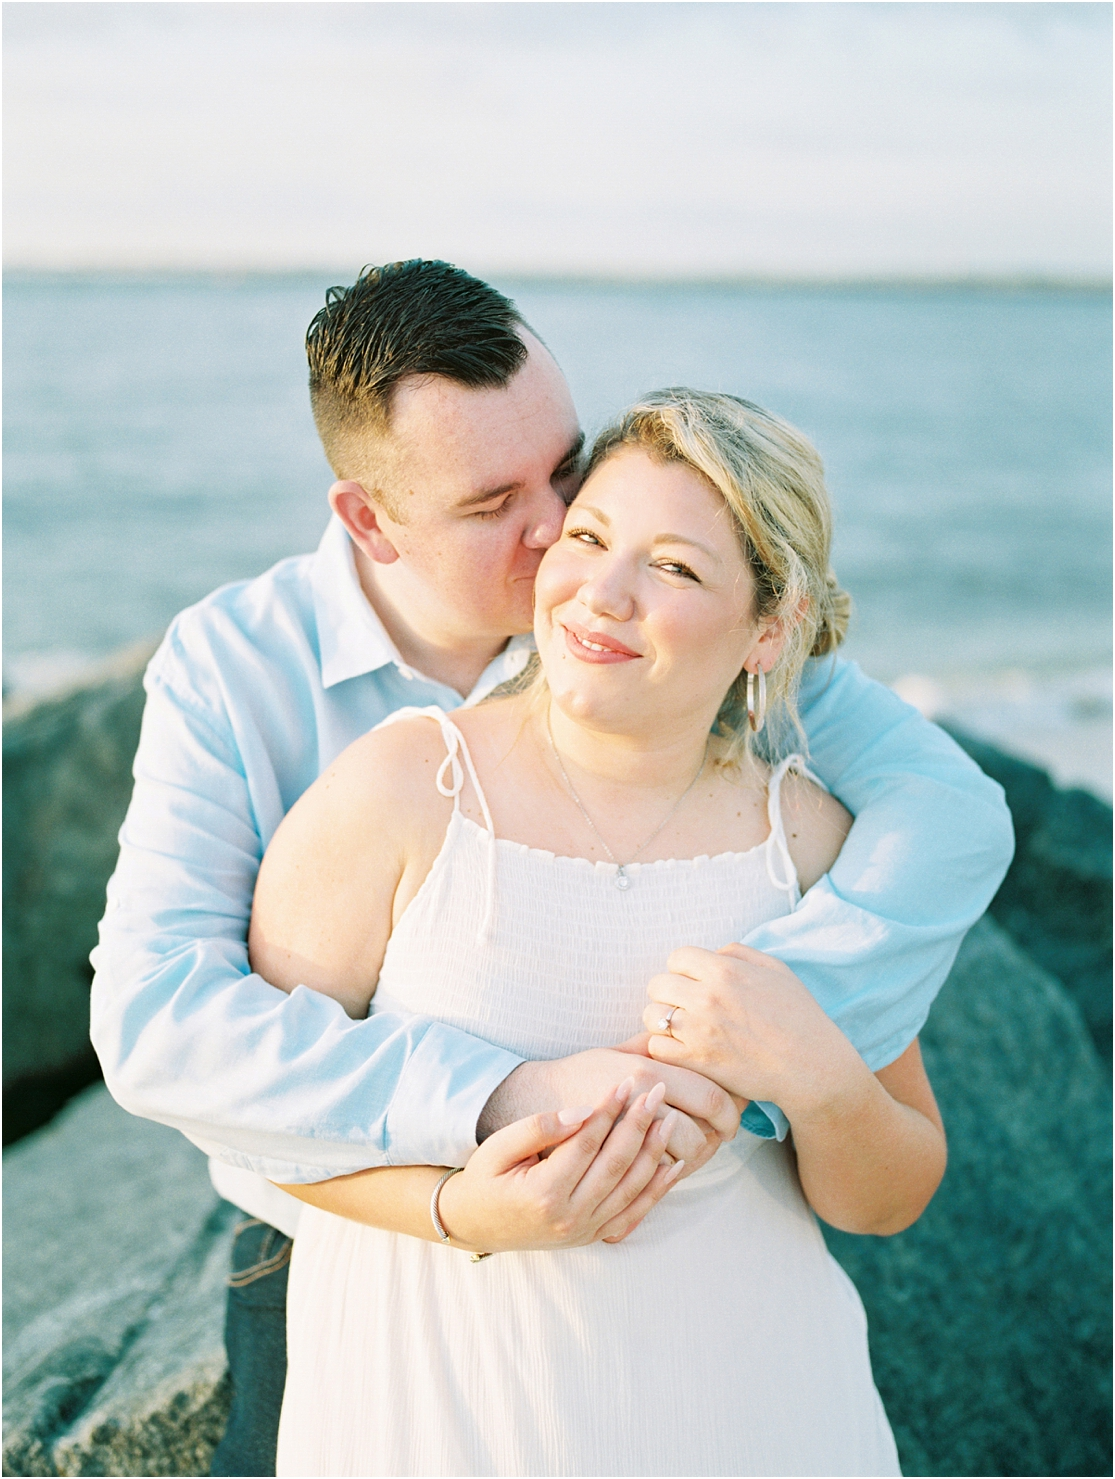 Lisa Silva Photography- Ponte Vedra Beach, St. Augustine and Jacksonville, Florida Fine Art Film Wedding Photography- Sunrise Engagement Session at  Vilano Beach_0007.jpg